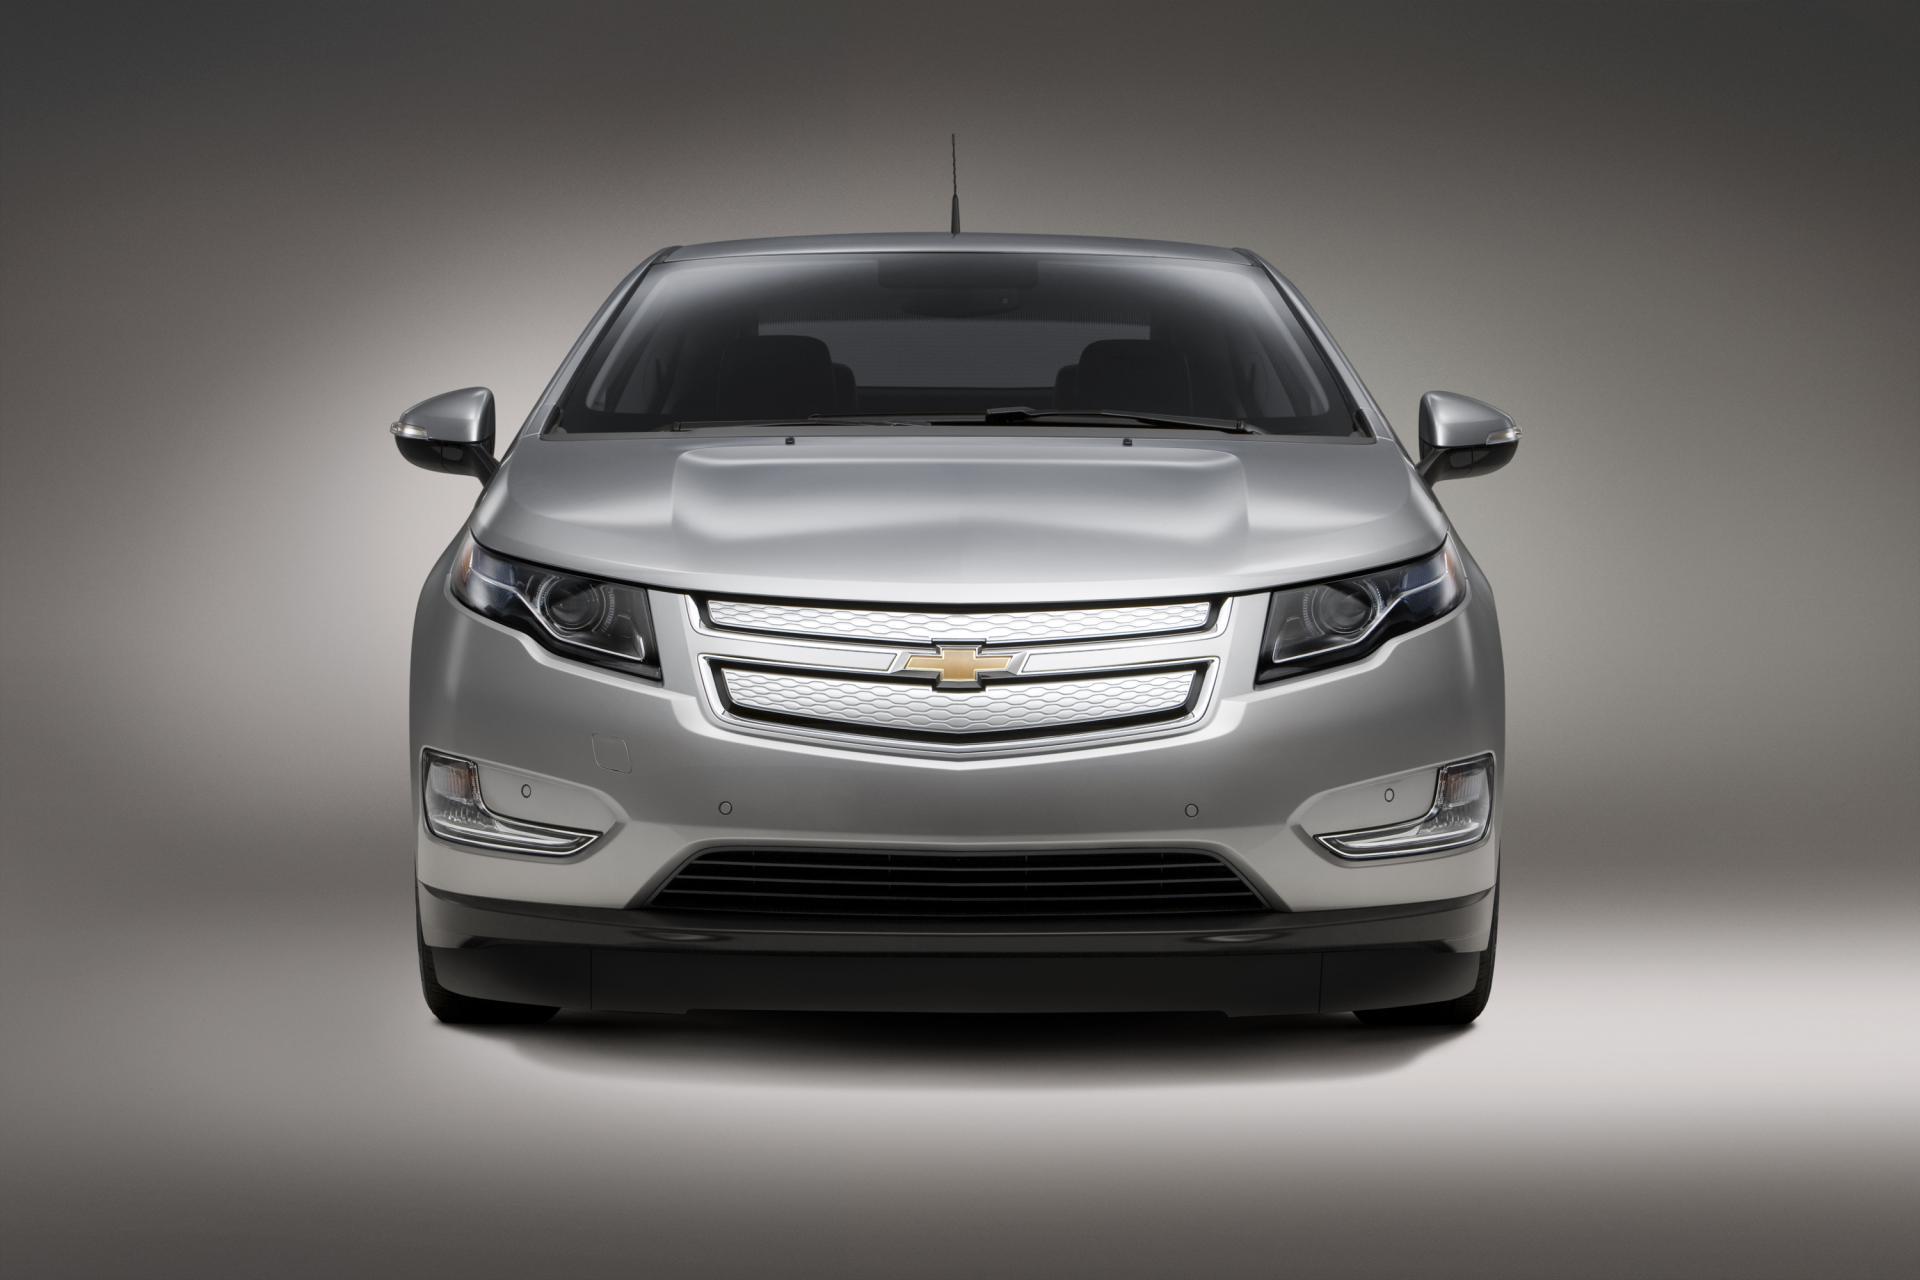 2014 Chevrolet Volt